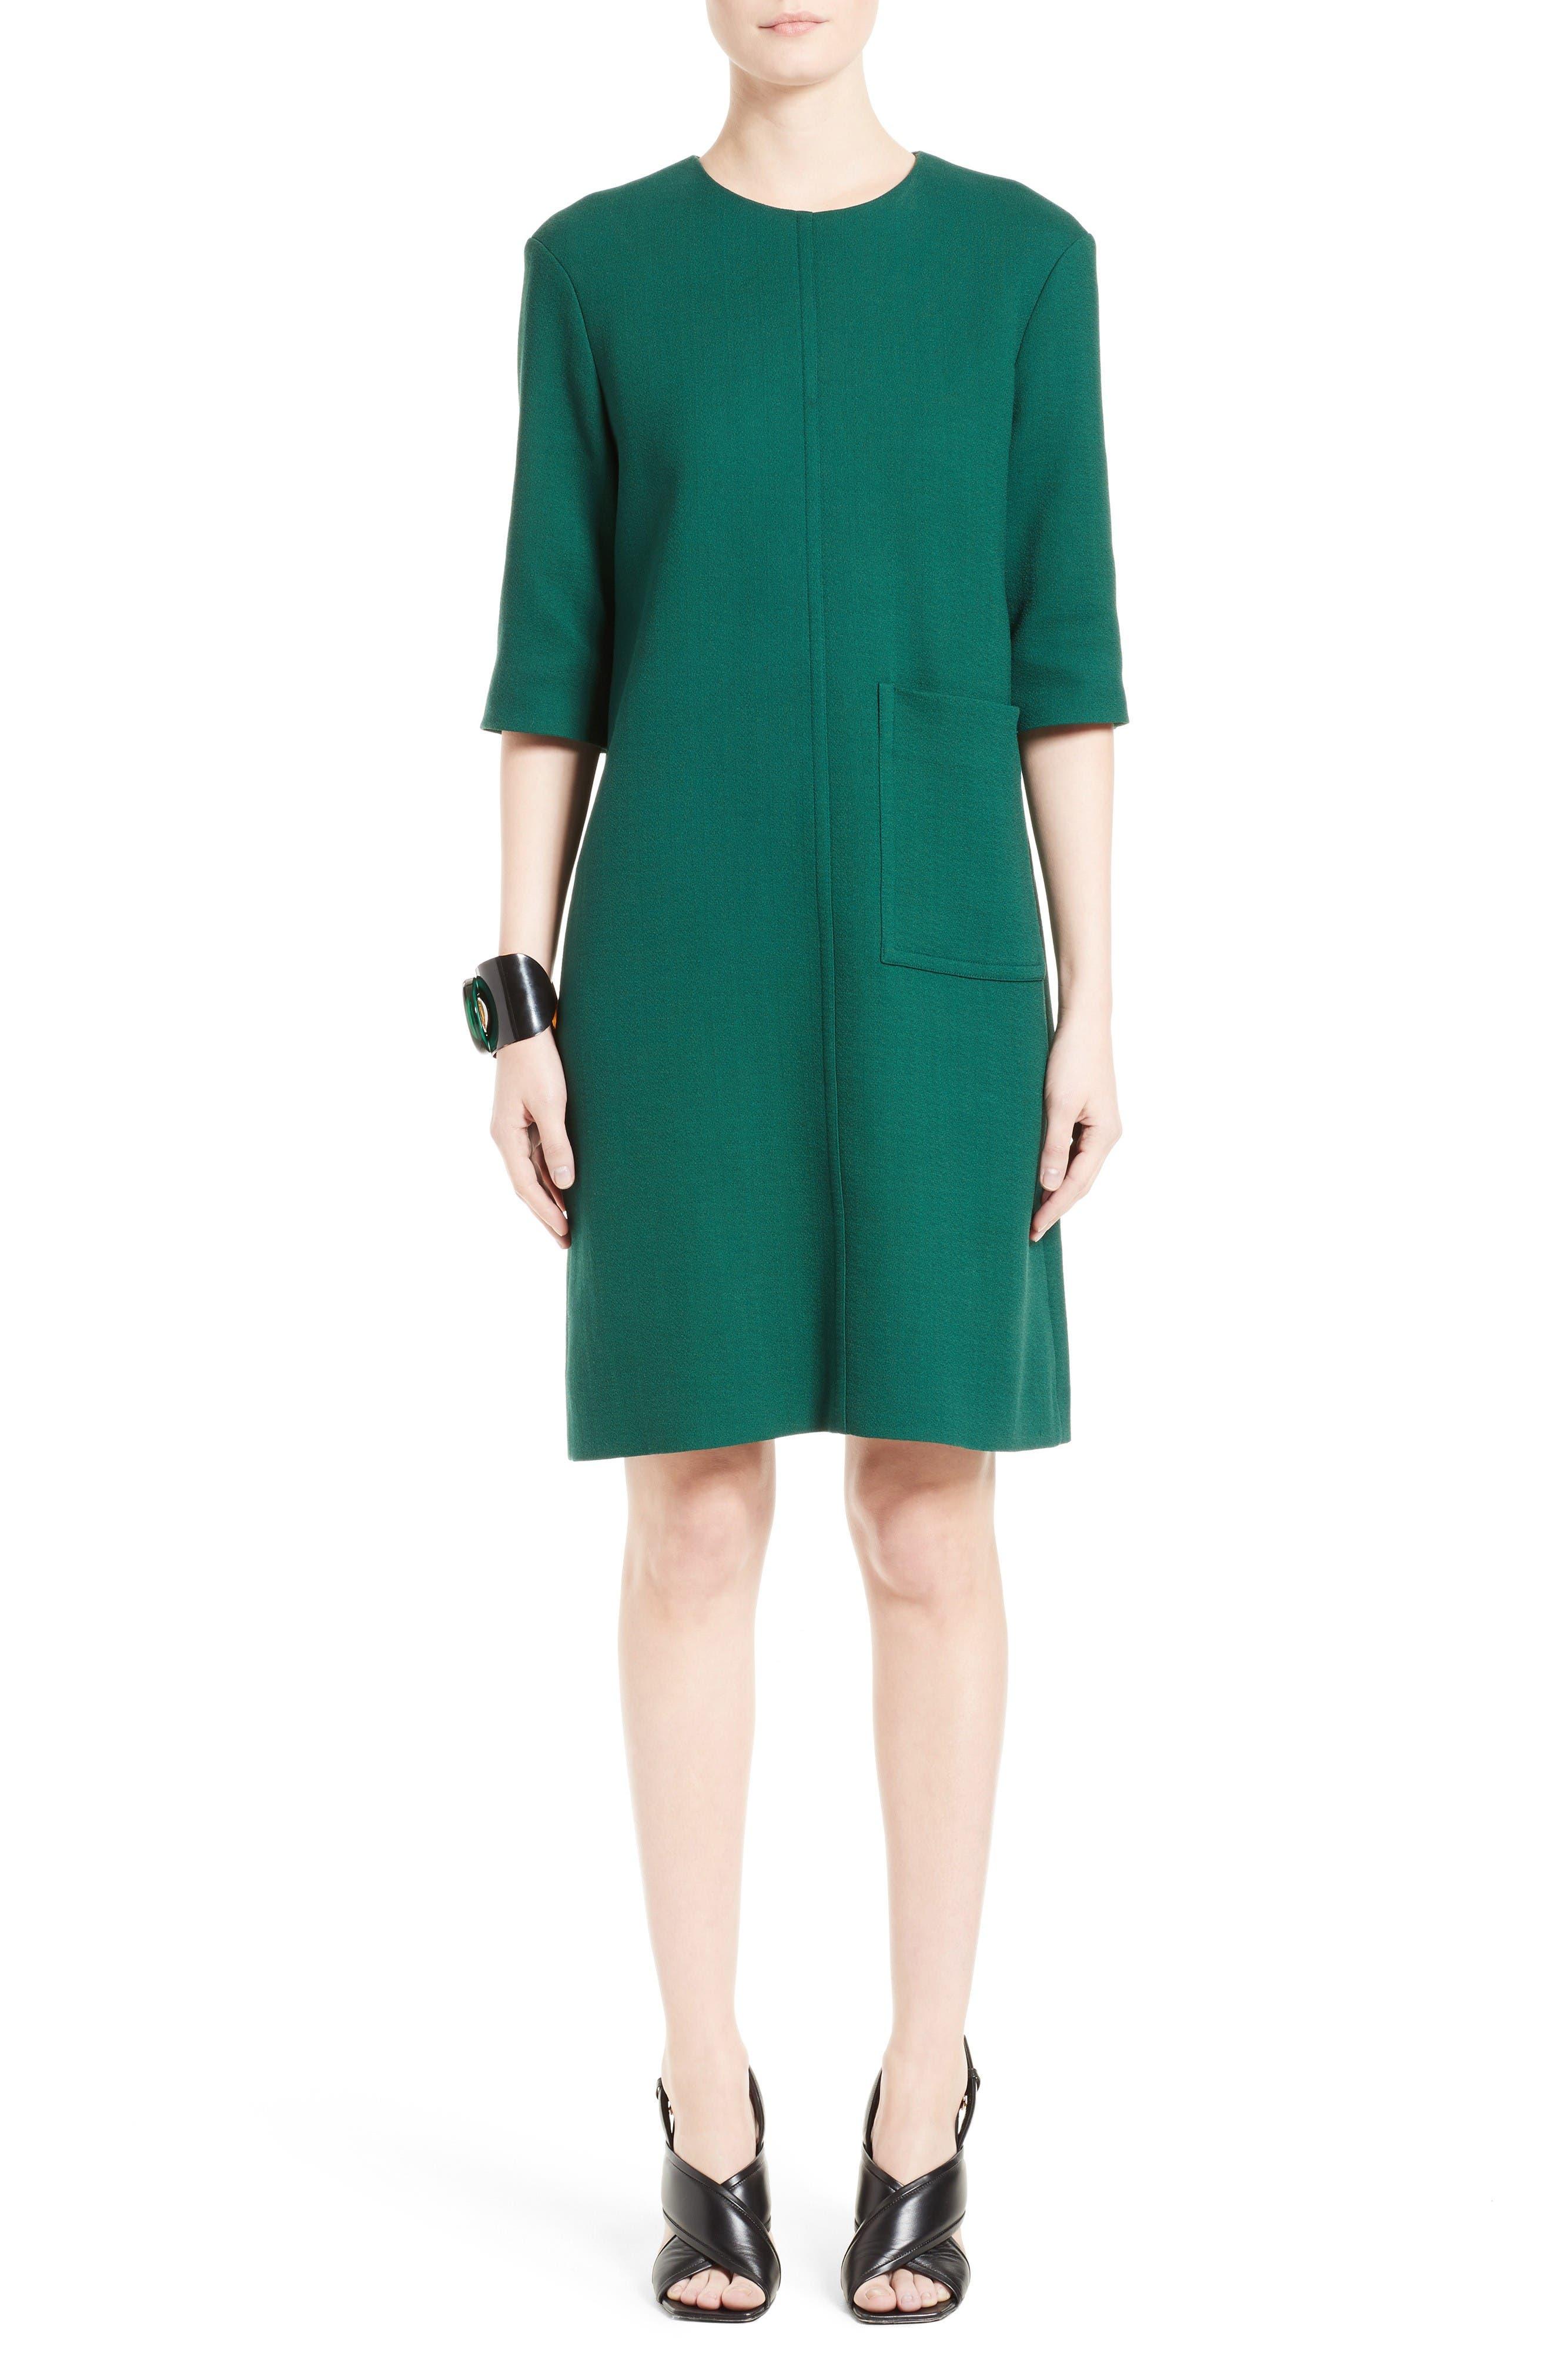 Marni Crepe Shift Dress